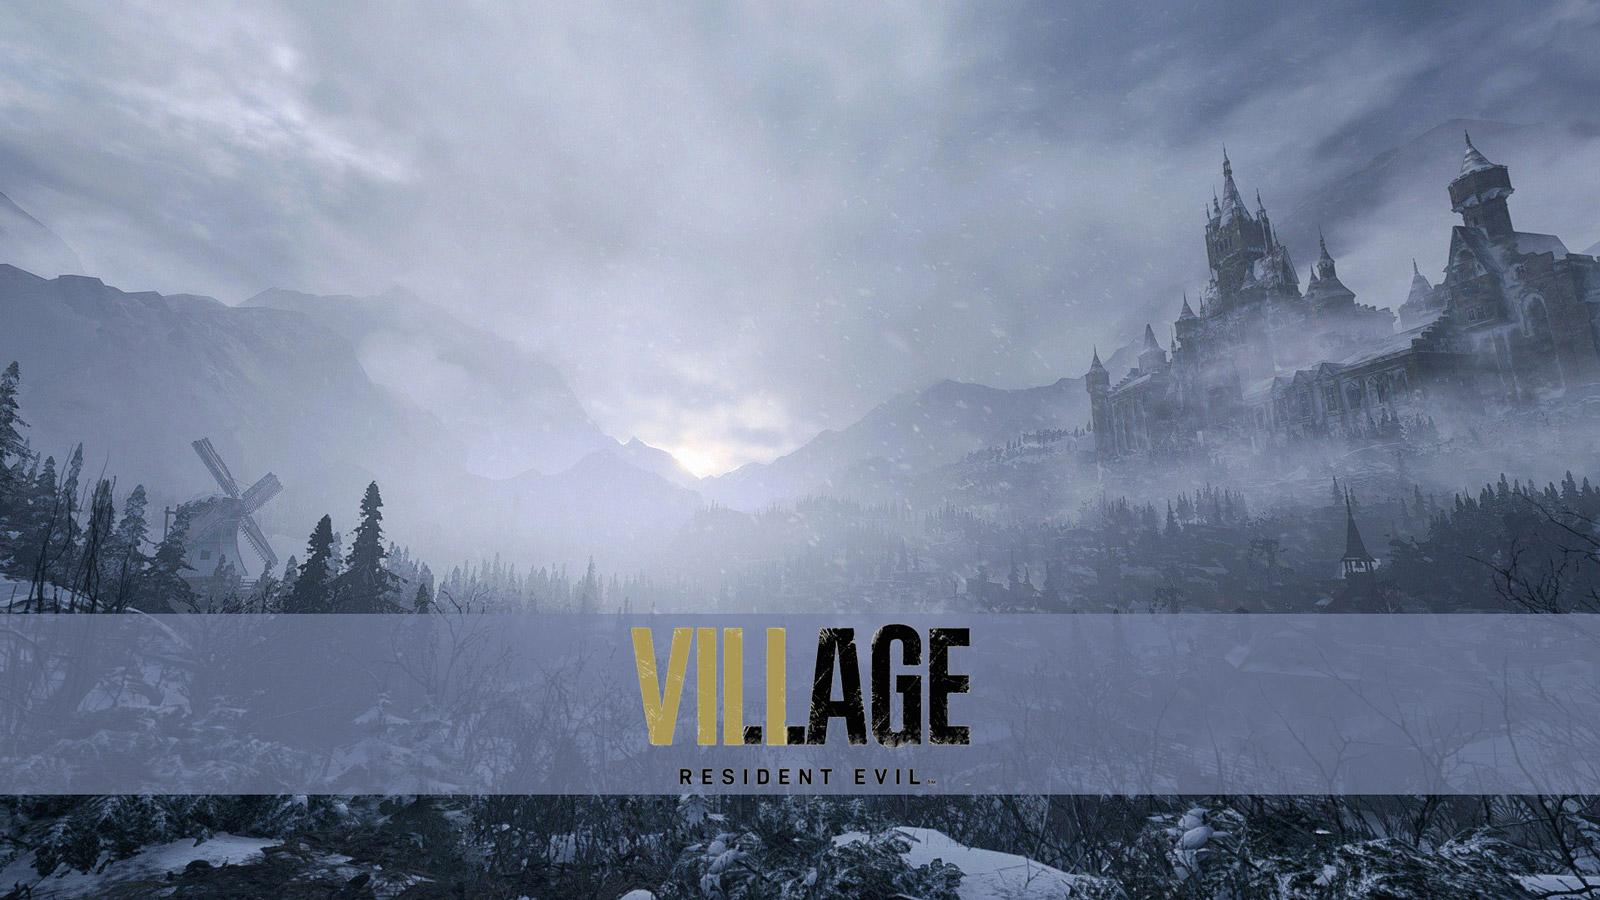 Free Resident Evil Village Wallpaper in 1600x900